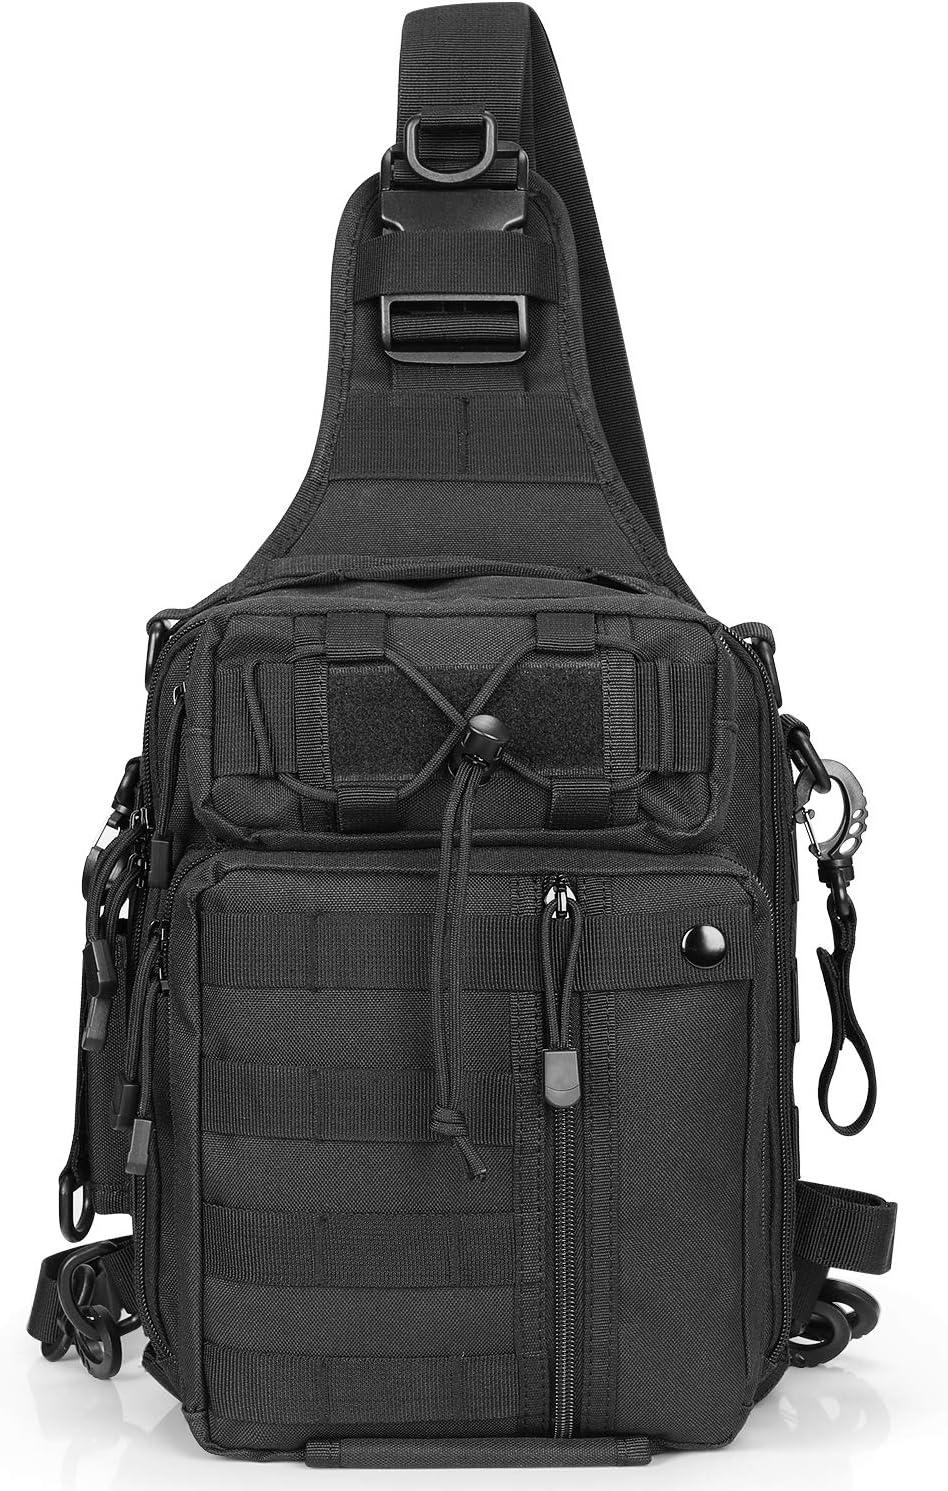 G4Free Fishing Tackle Storage Bag Water Sling Resis Surprise price Wholesale Tactical